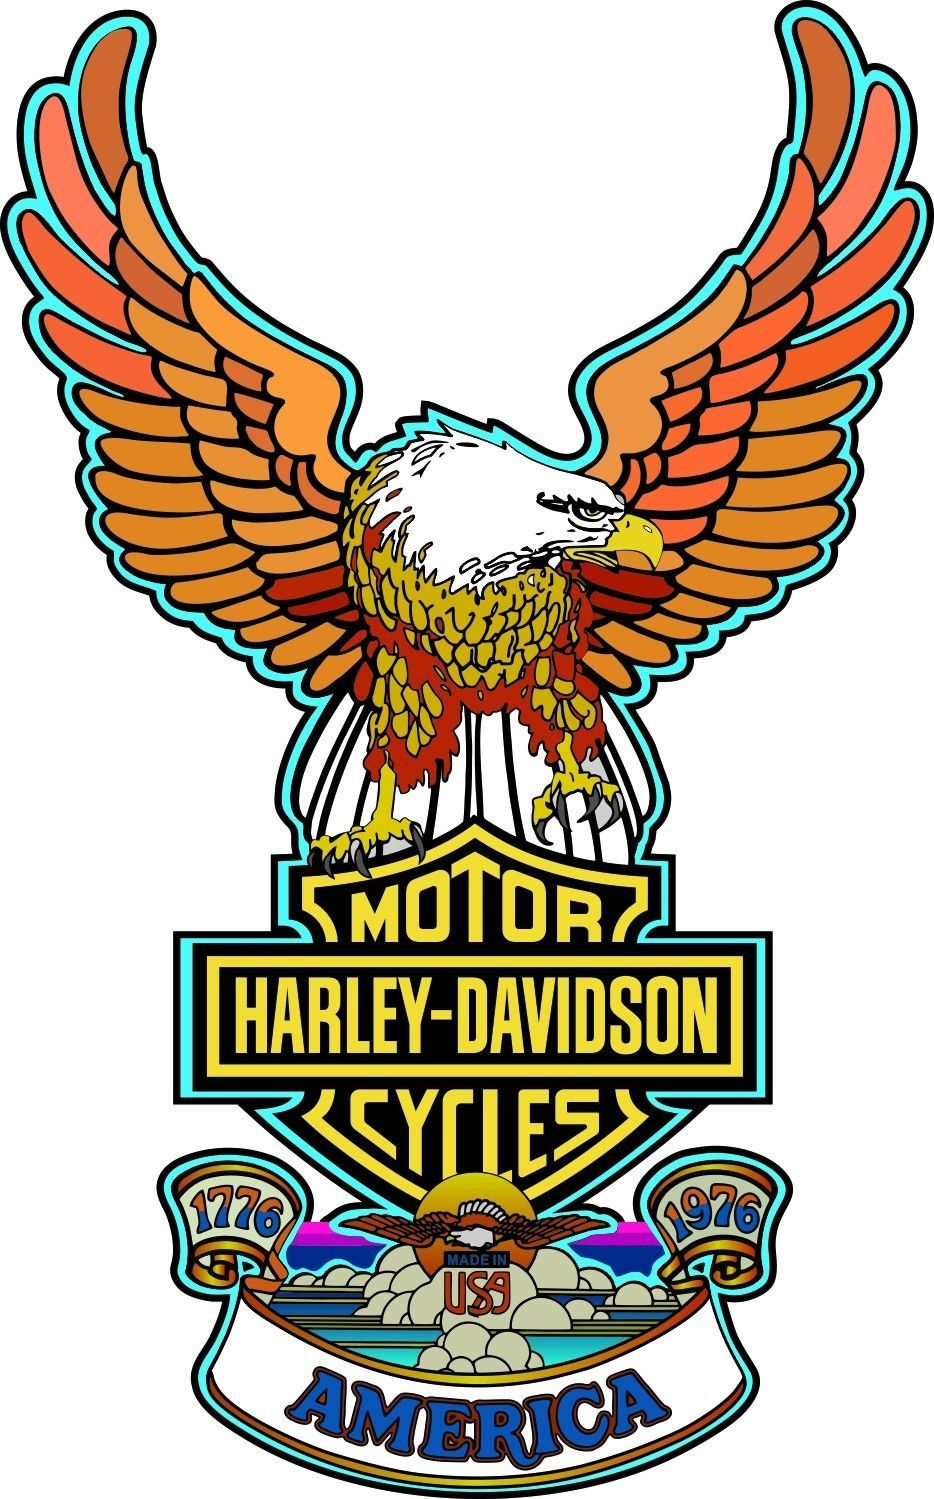 Harley Bicentennial Top Decal Tank 61831 76 1976 Sportster